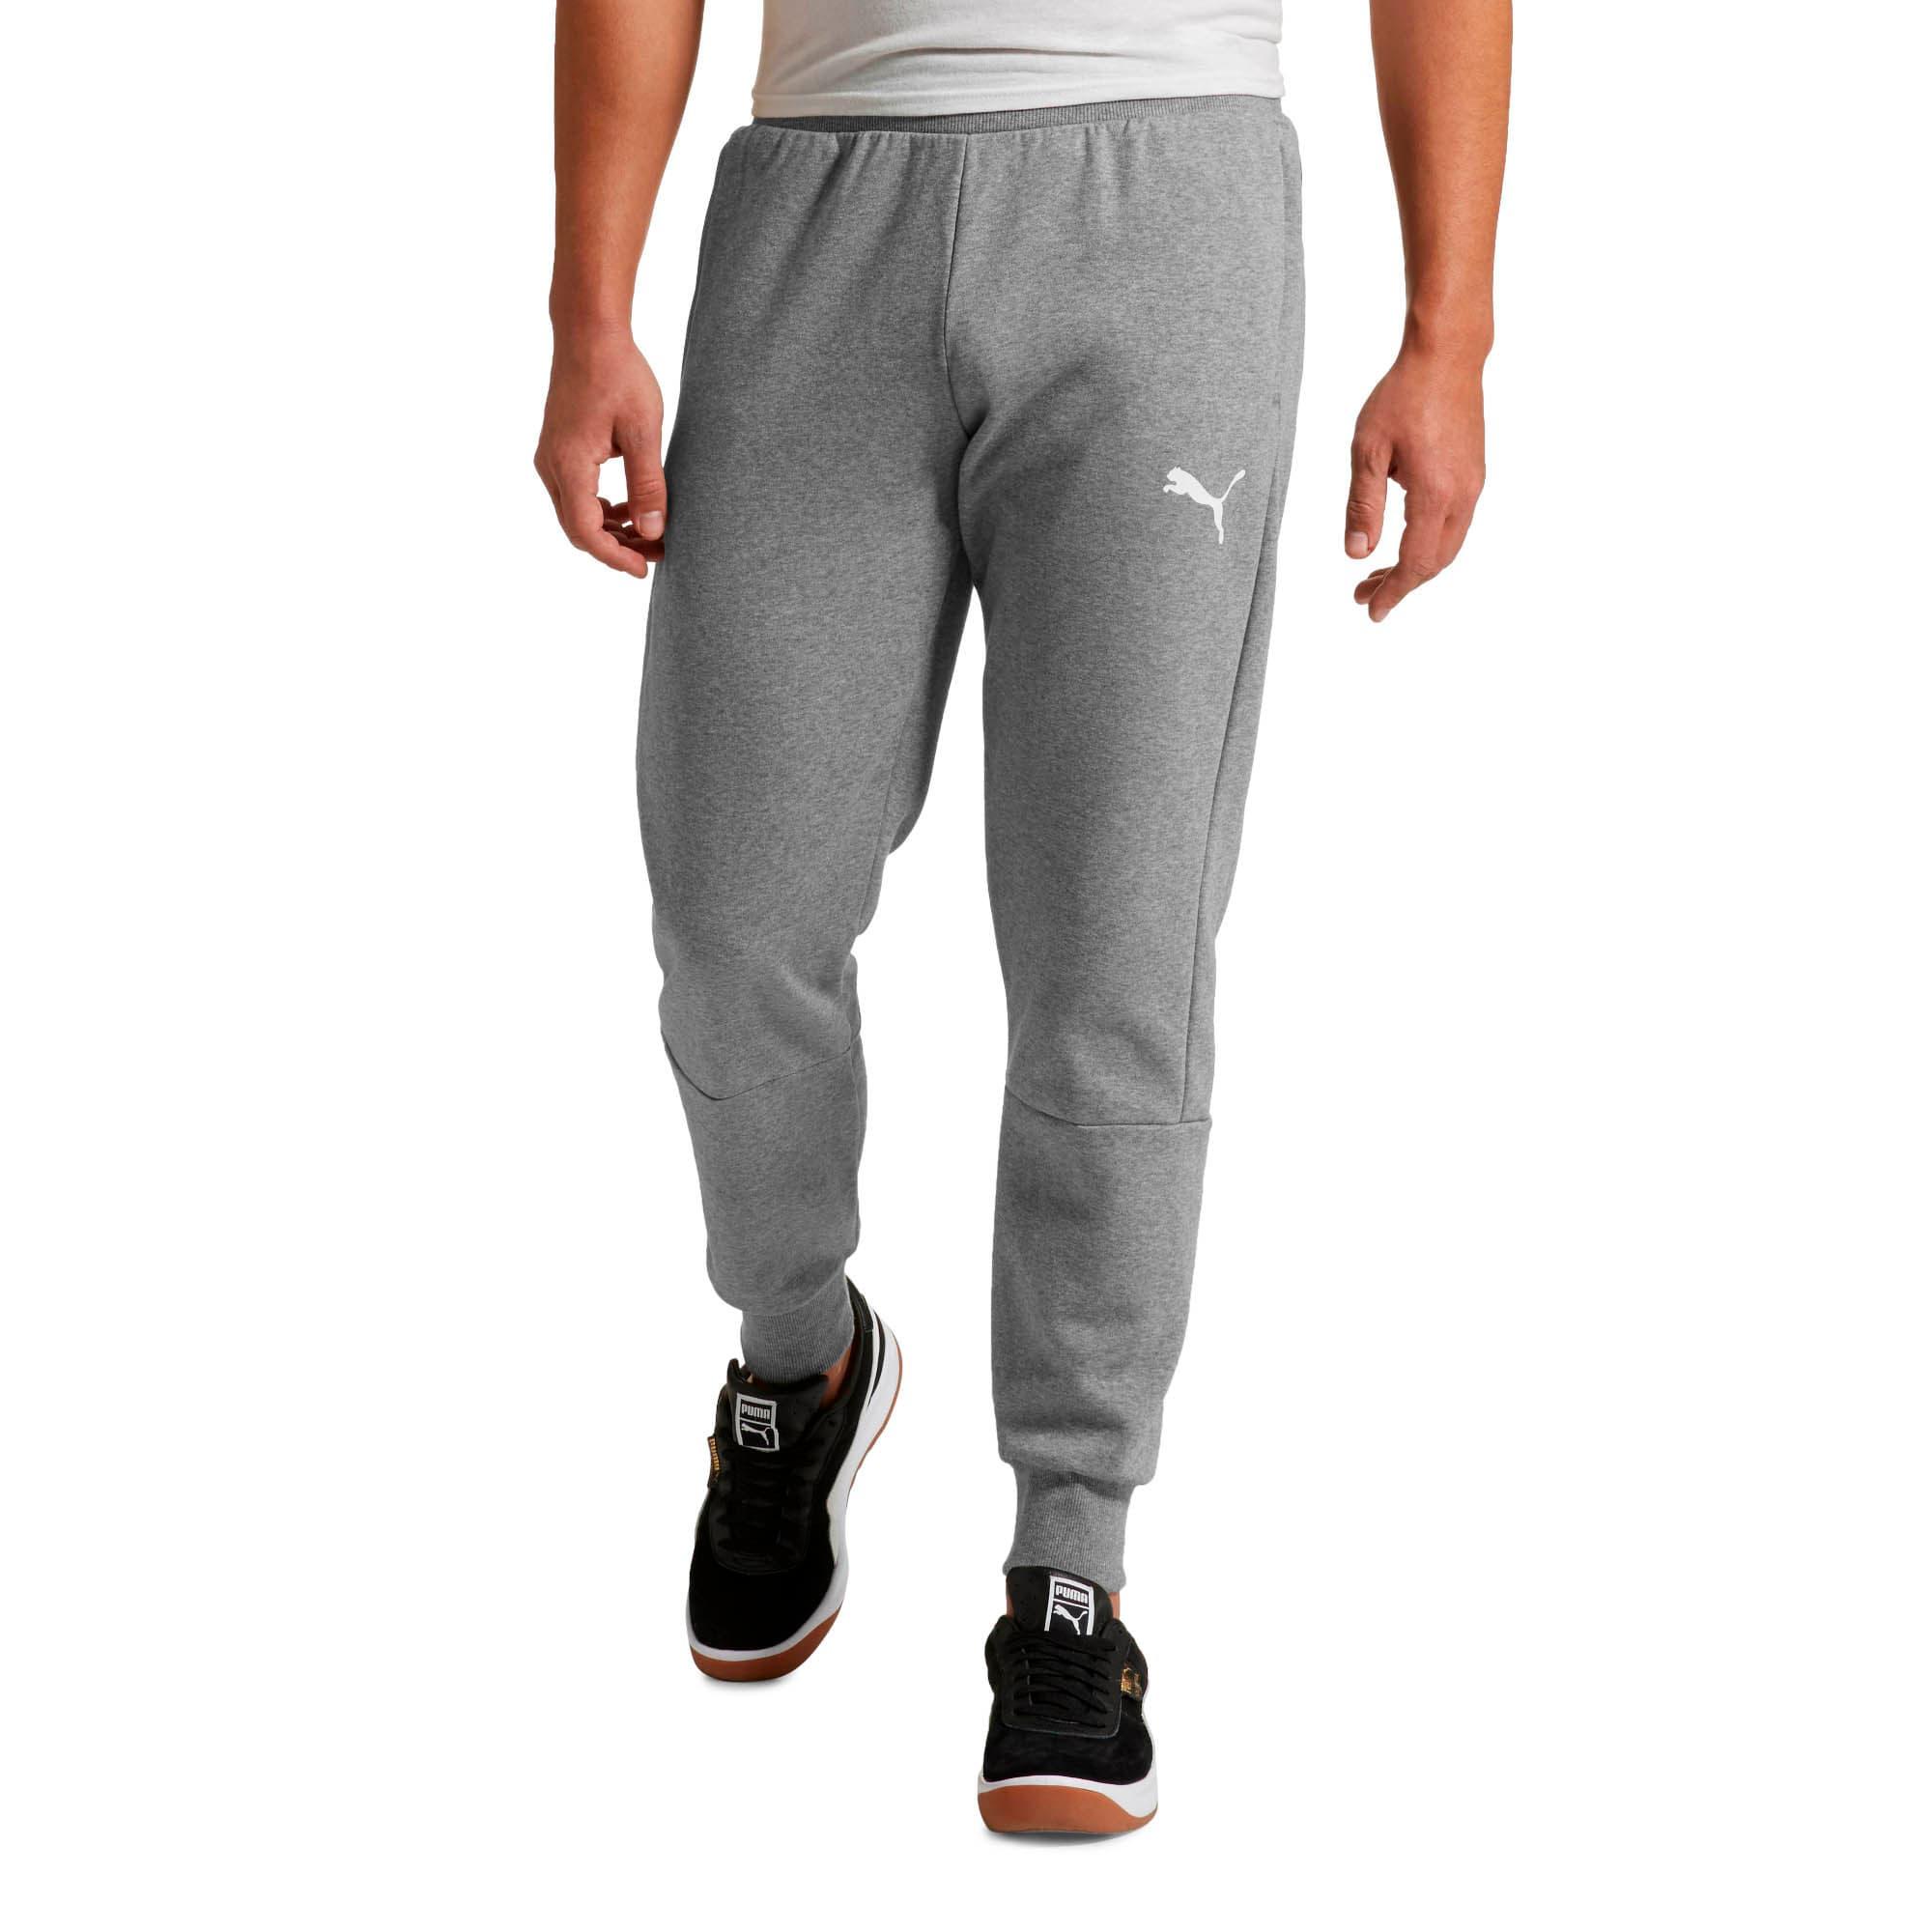 Thumbnail 2 of Modern Sports Fleece Pants, Medium Gray Heather, medium